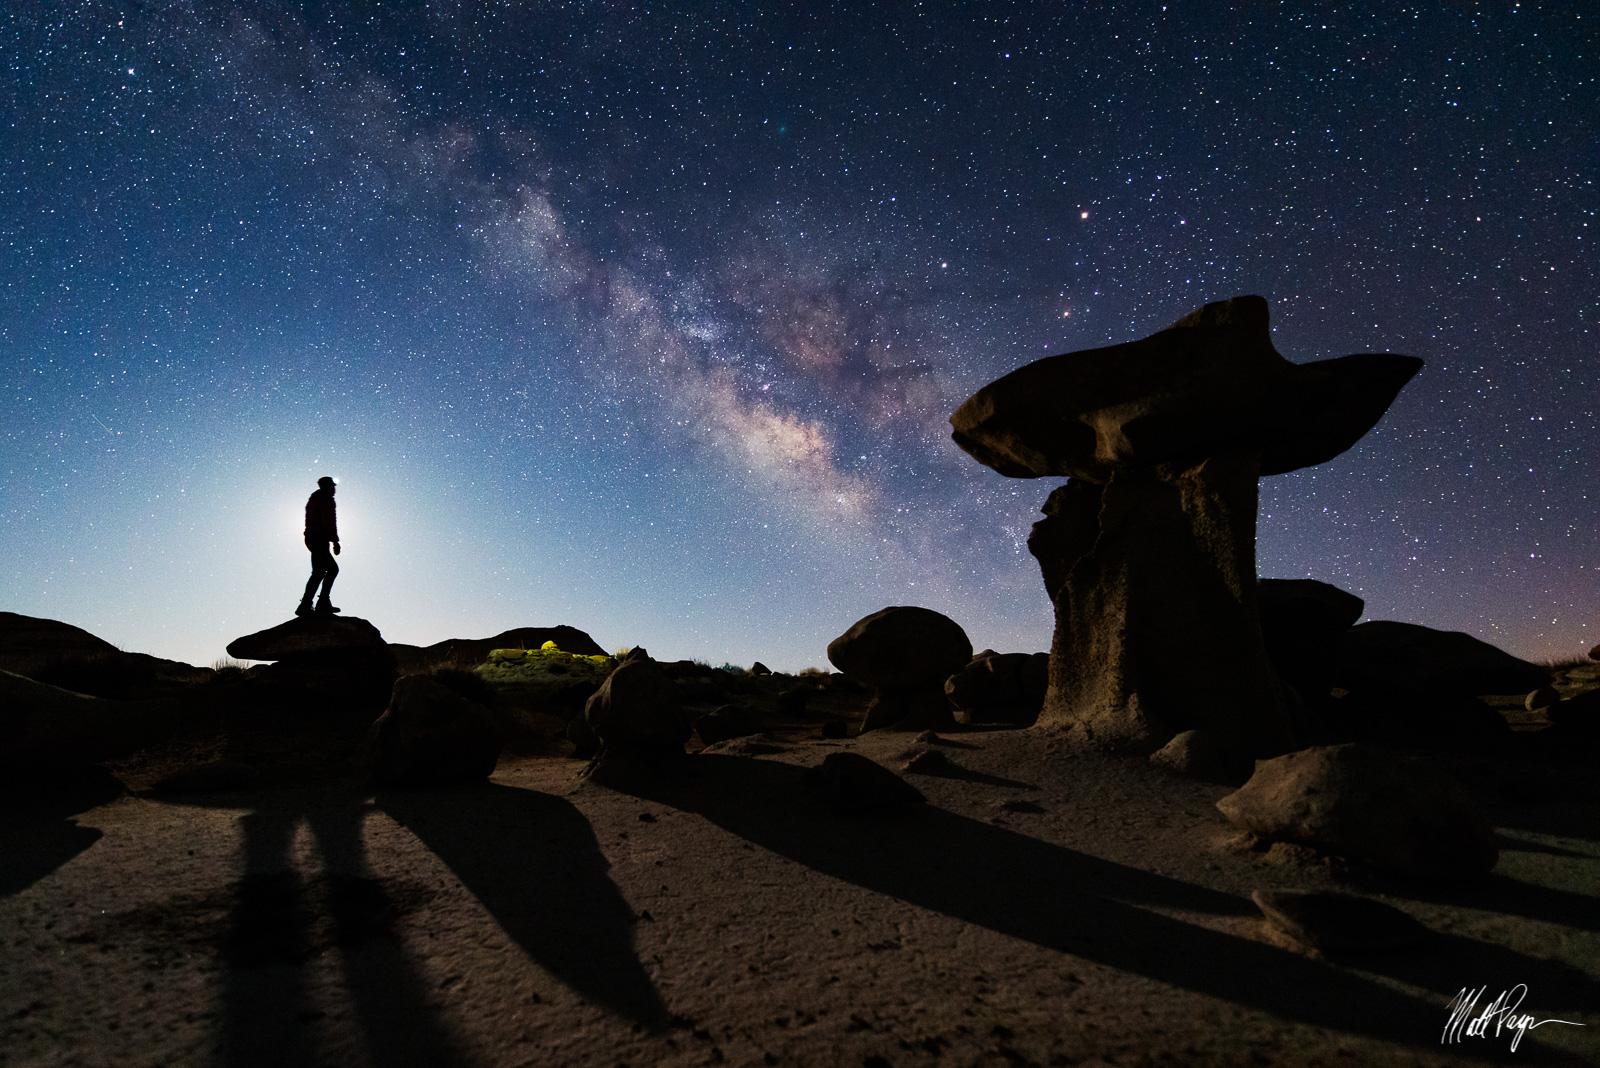 April, Bisti Badlands, De-Na-Zin Wilderness, Hoodoo, Milky Way, New Mexico, Night, Nightscape, Stars, The Pedestal, Wilderness, desert, Landscape Photography, photo